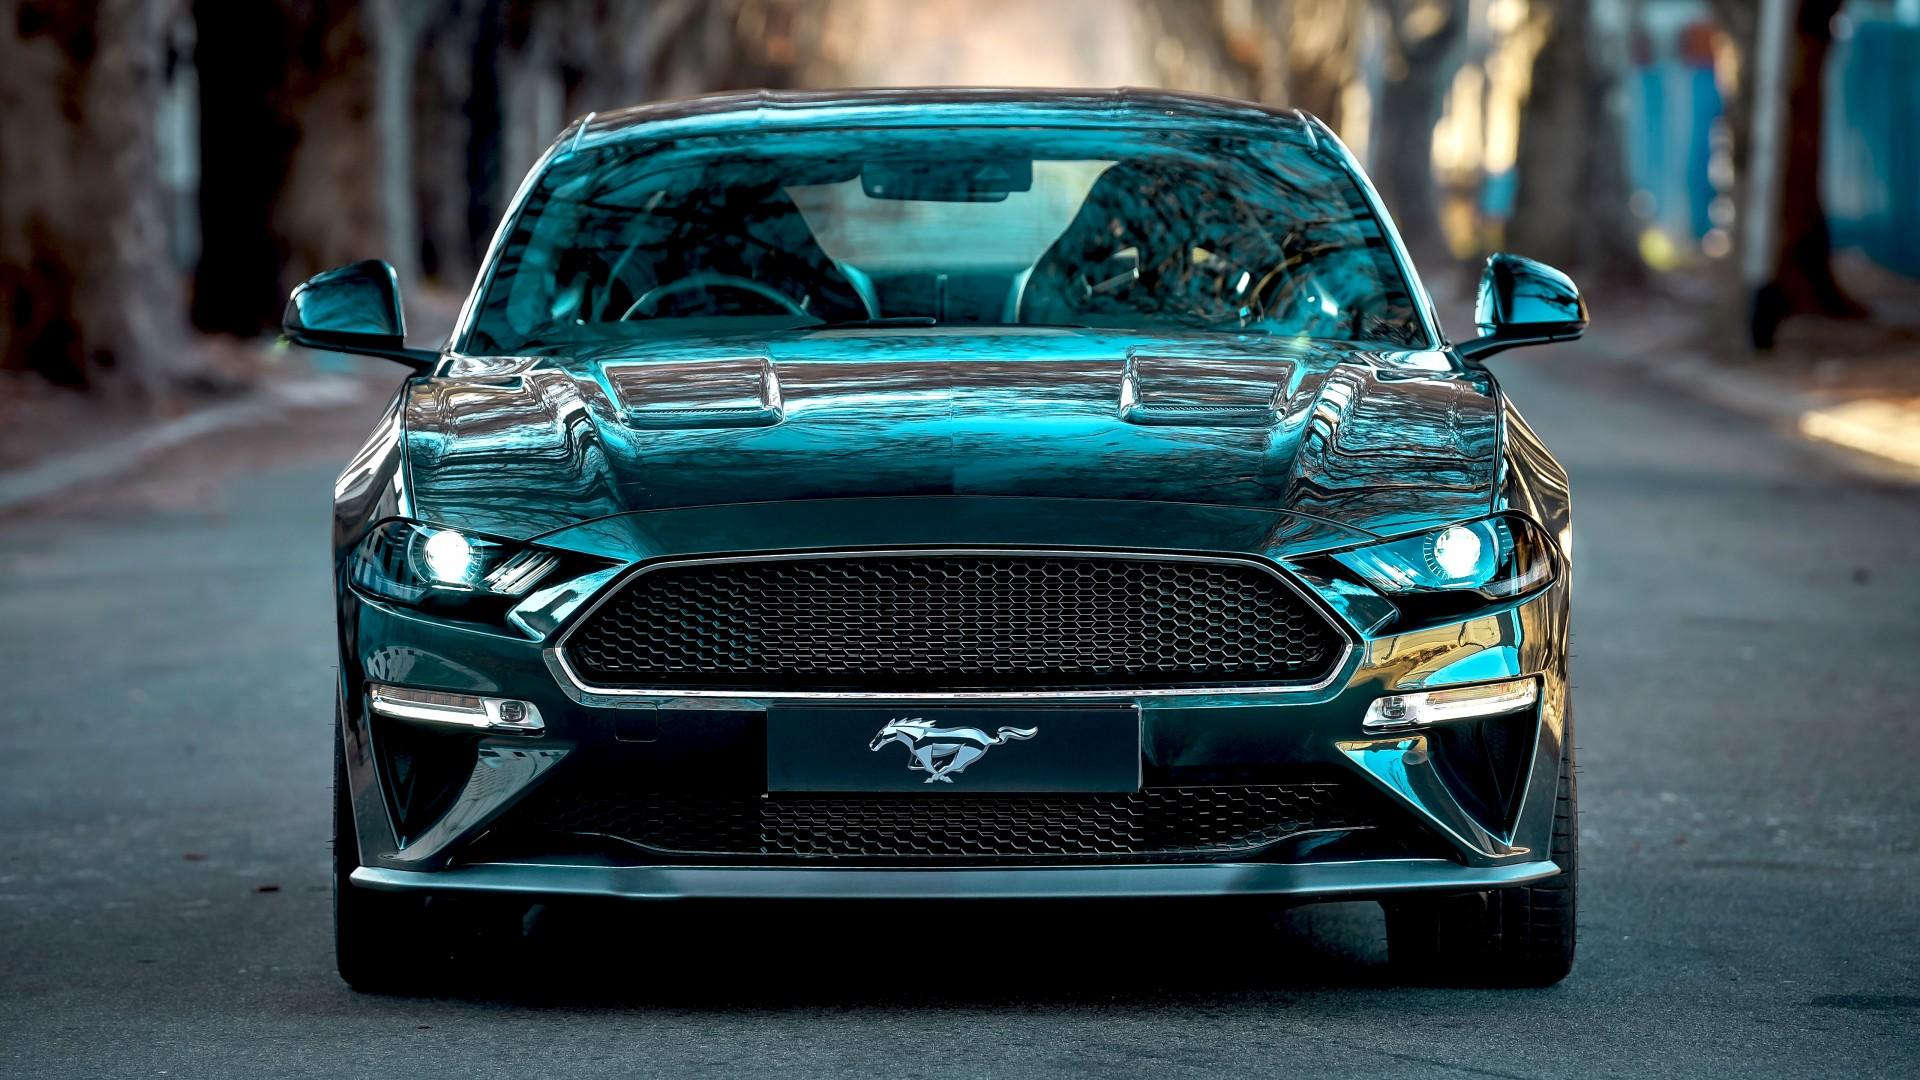 2019 Ford Raptor >> Ford Mustang Bullitt 2019 4K 3 Wallpaper   HD Car Wallpapers   ID #12962